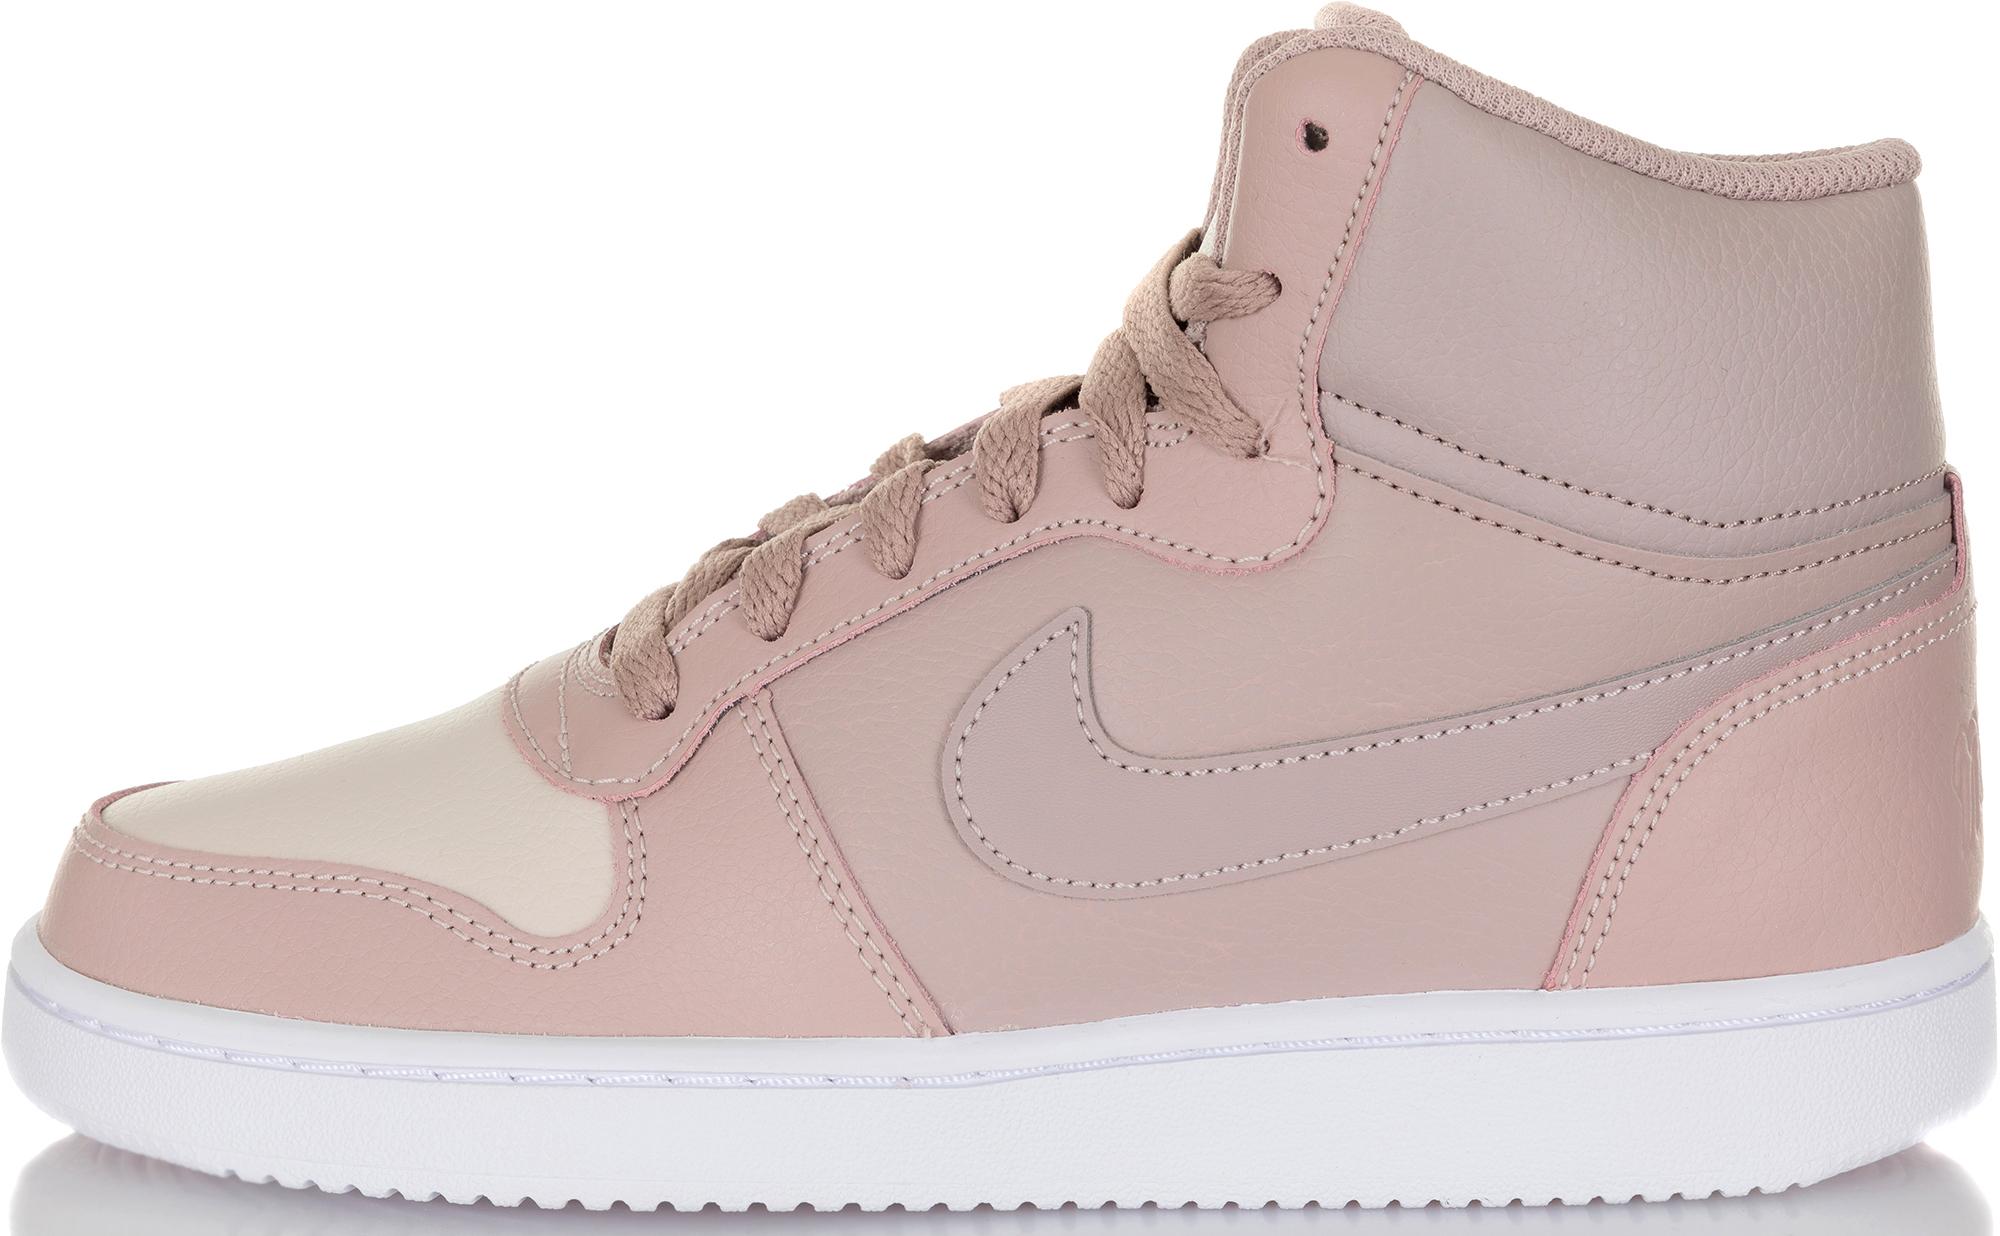 Nike Кеды женские Nike Ebernon Mid, размер 40 цены онлайн